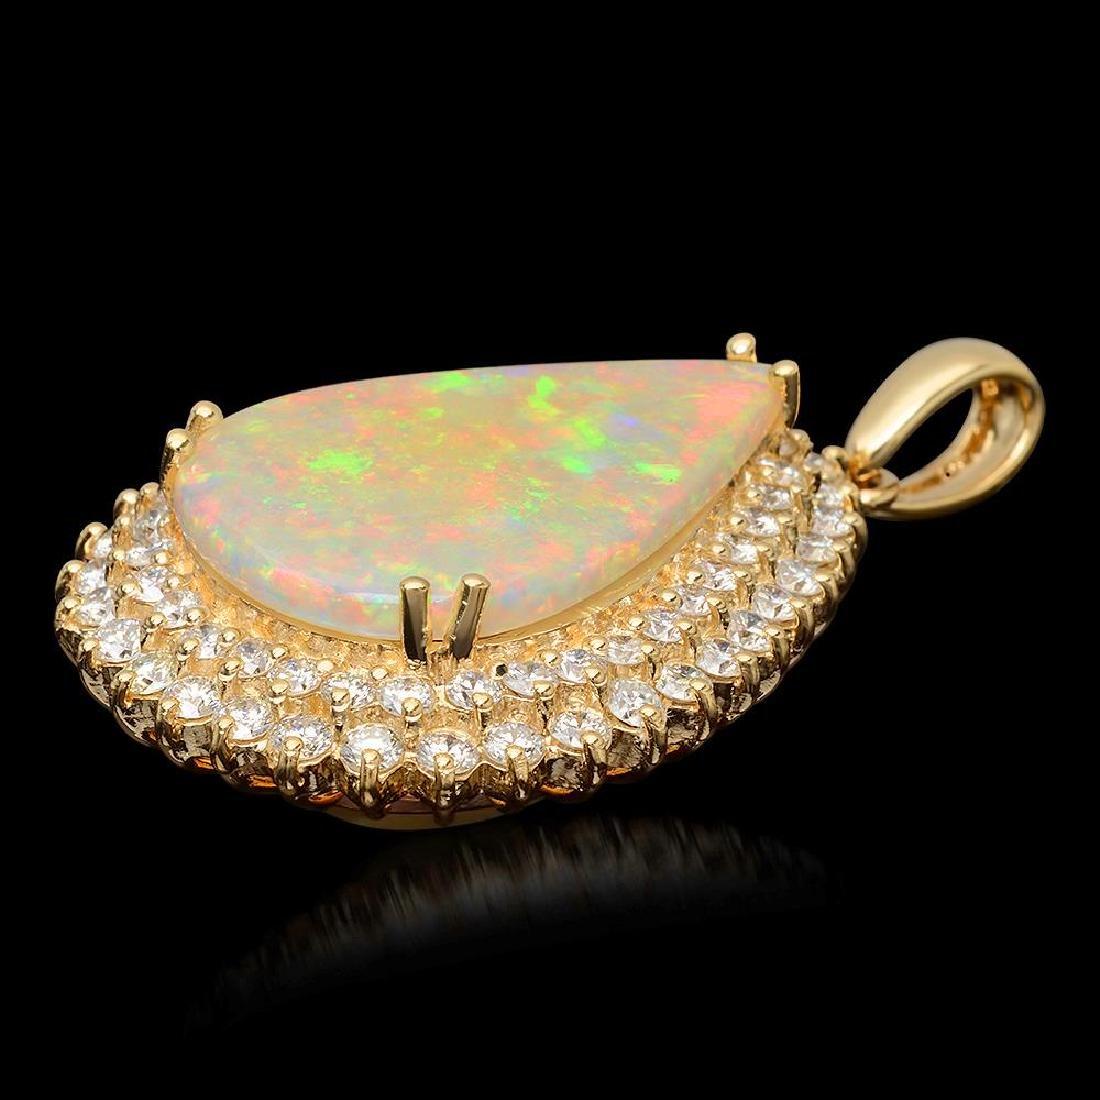 14K Gold 7.12ct Opal & 2.03ct Diamond Pendant - 2